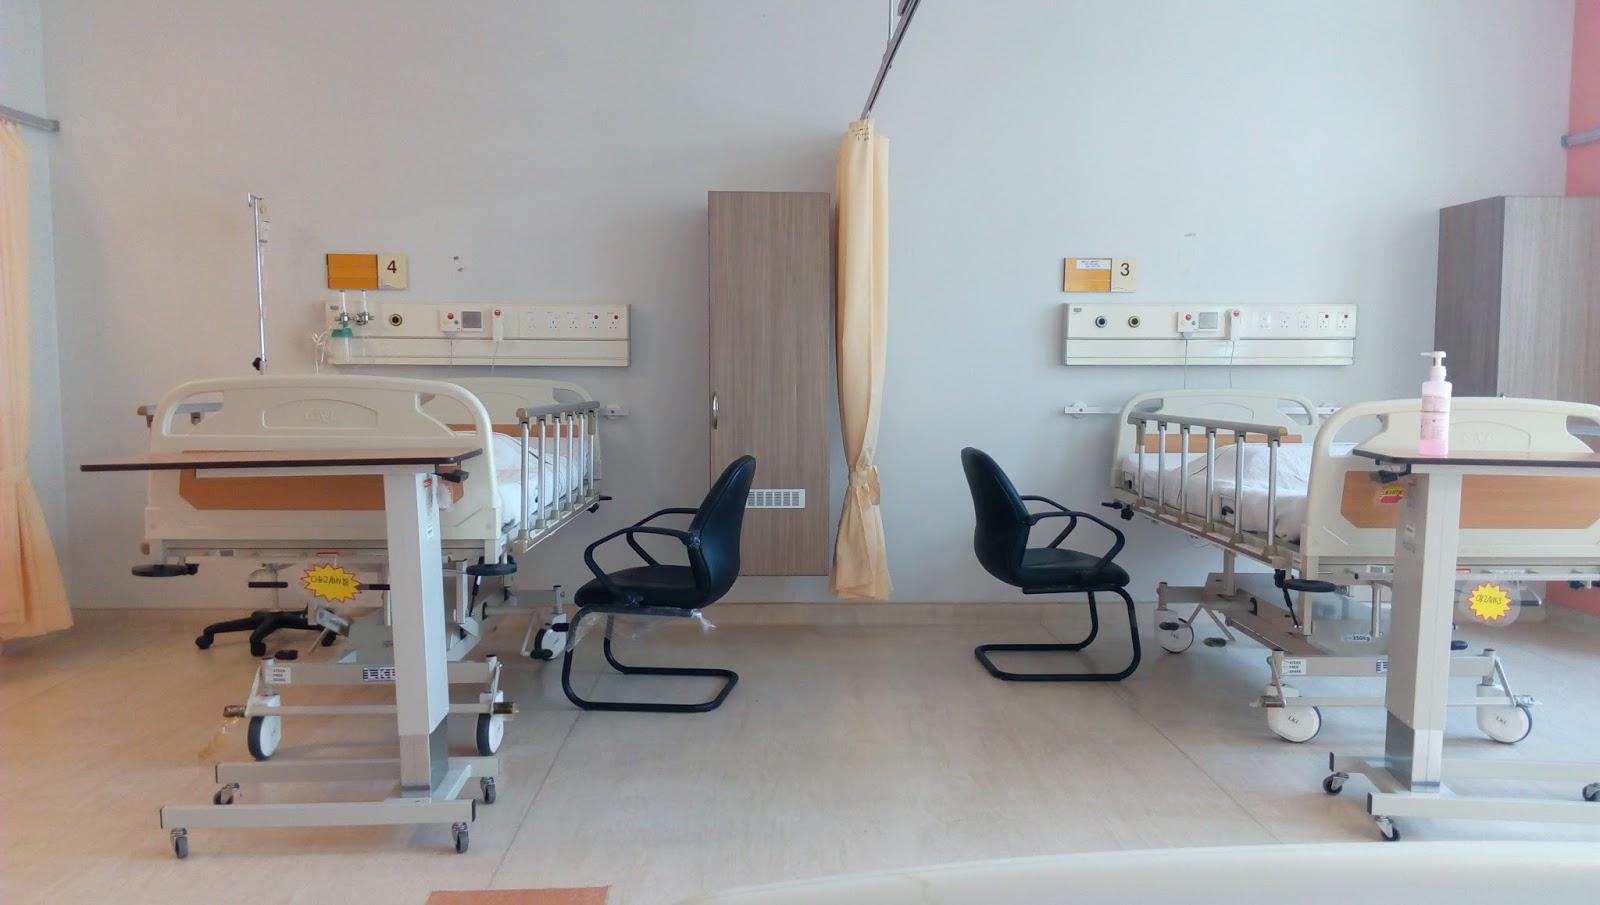 Hospital rooms at Hospital Tuanku Fauziah